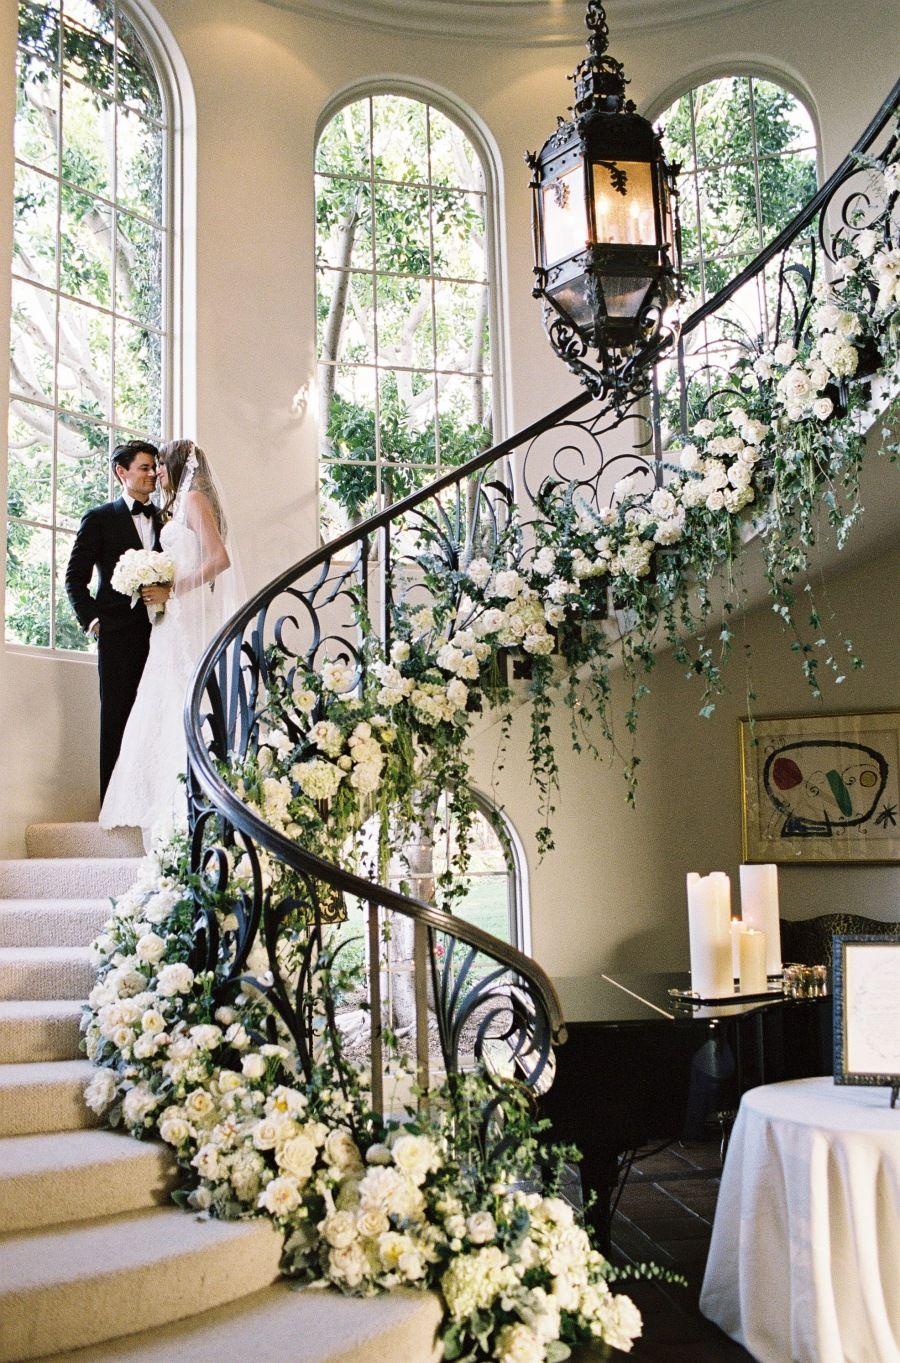 Best 25+ Wedding decorations ideas on Pinterest | Wedding ...